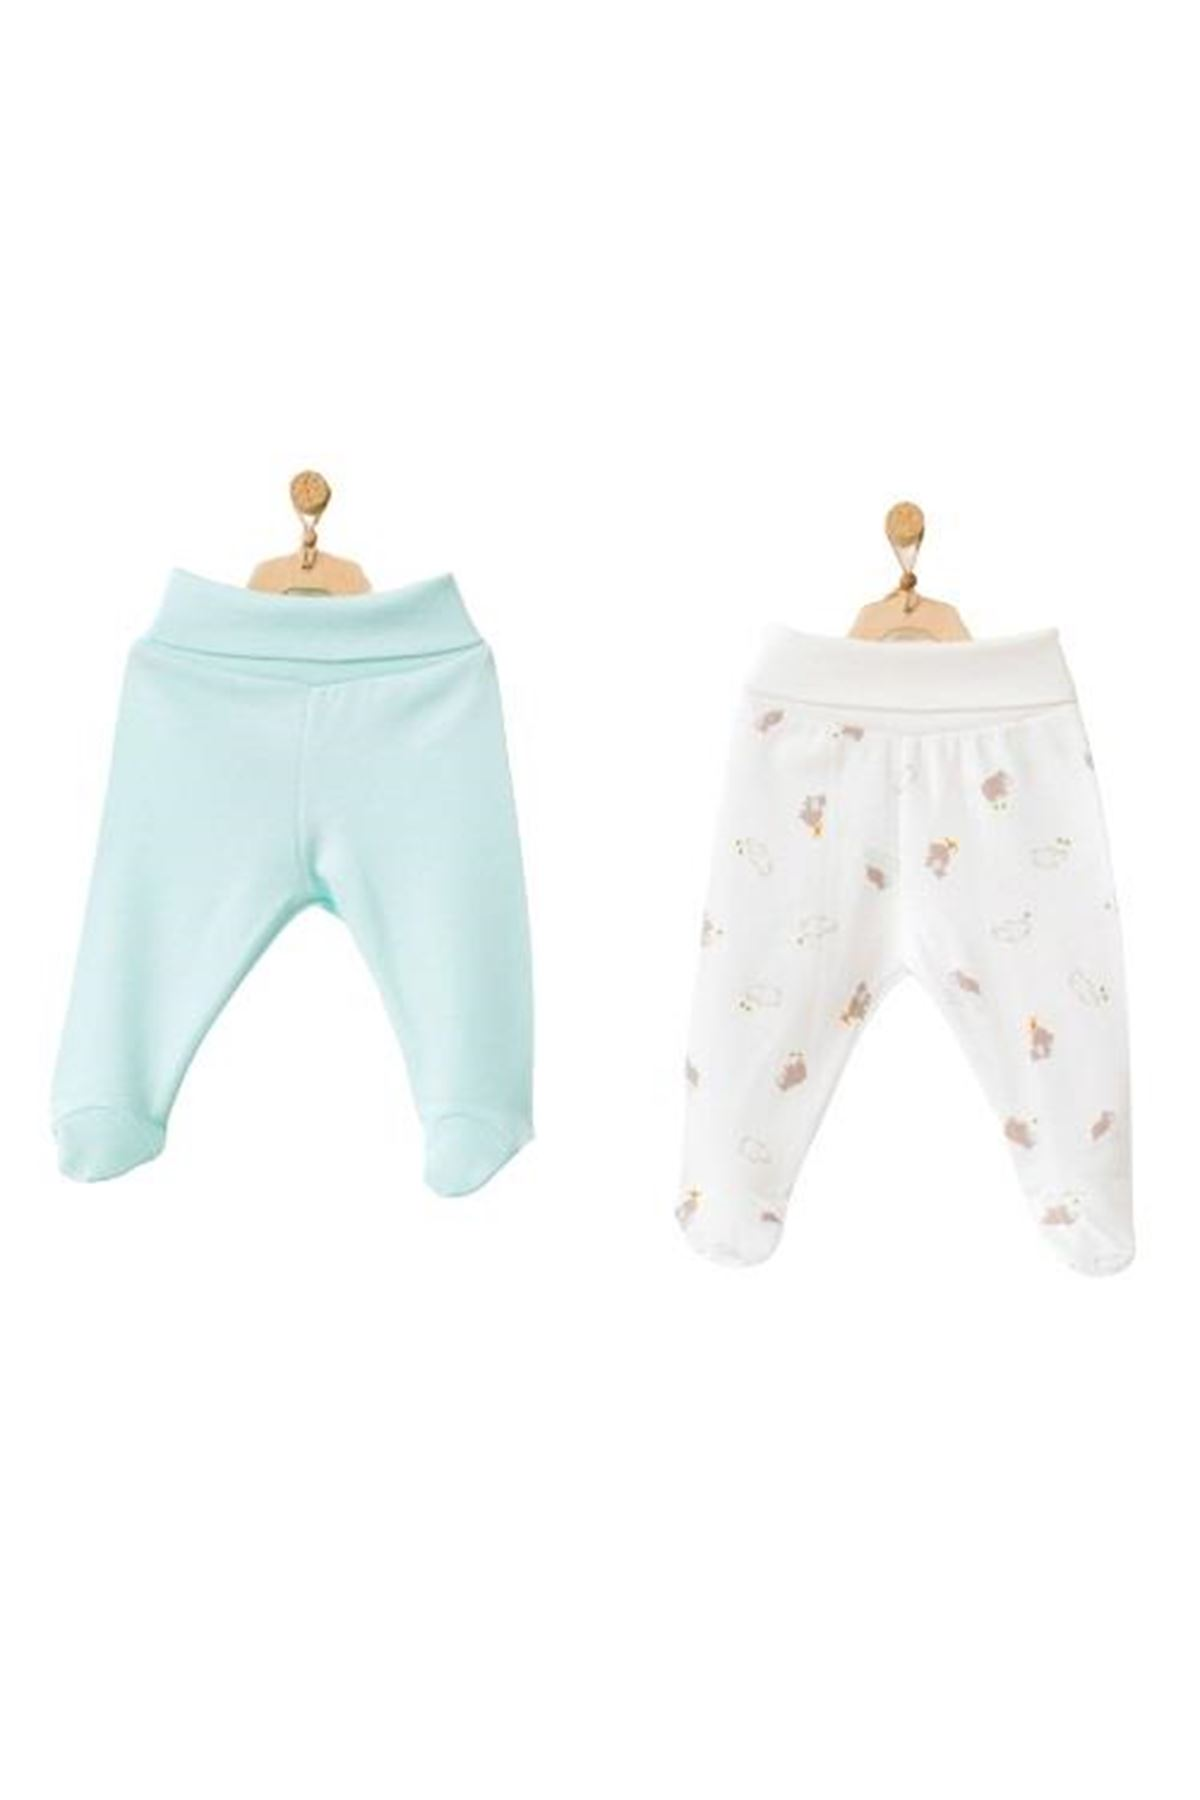 Andywawa AC21763 Hippo 2li Pantolon Mint